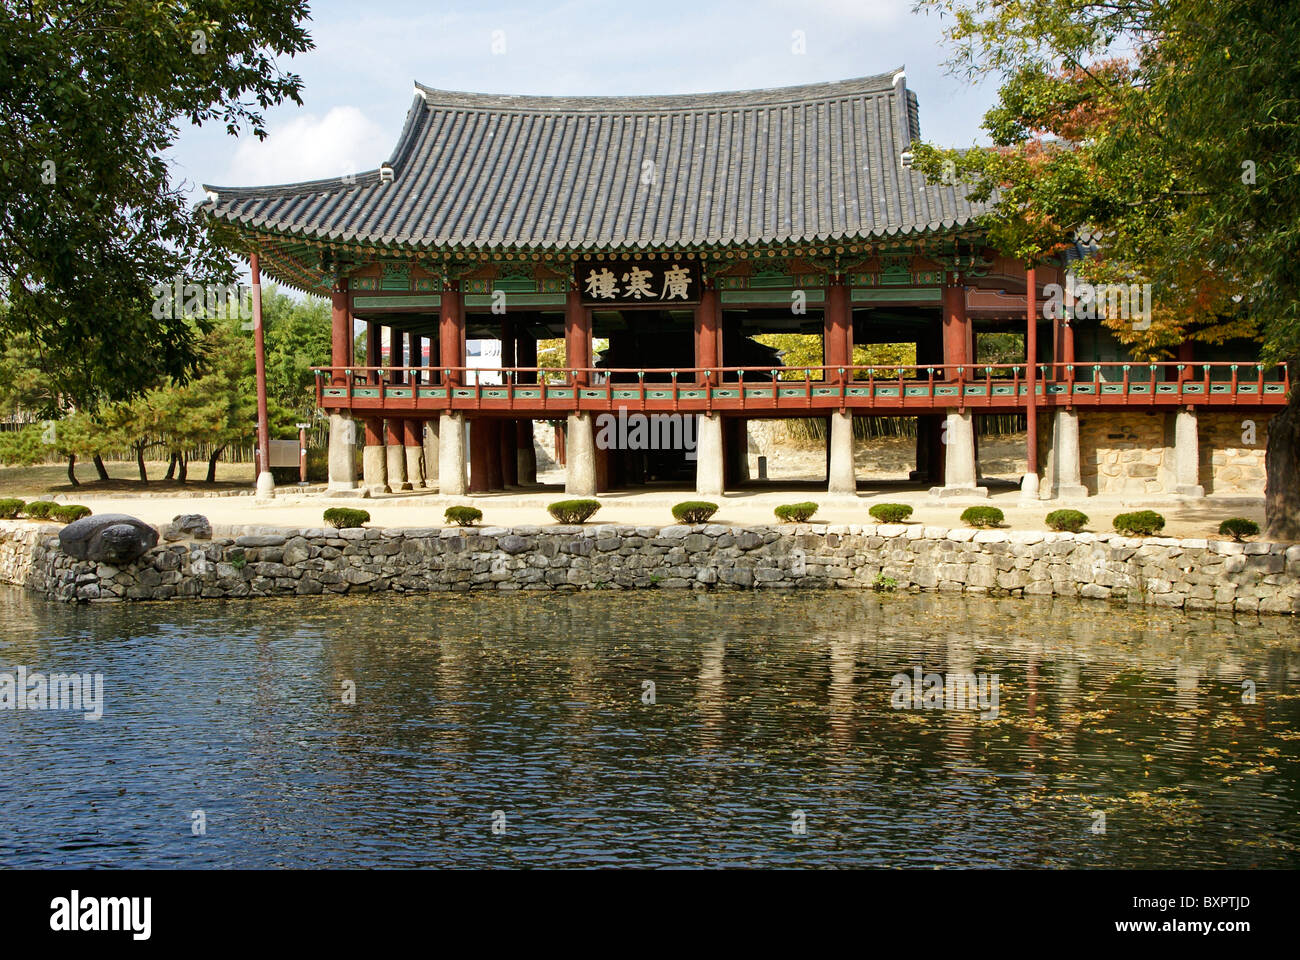 Gwanghal-lu Pavilion, Gwanghalluwon Garden, Namwon, South Korea ...